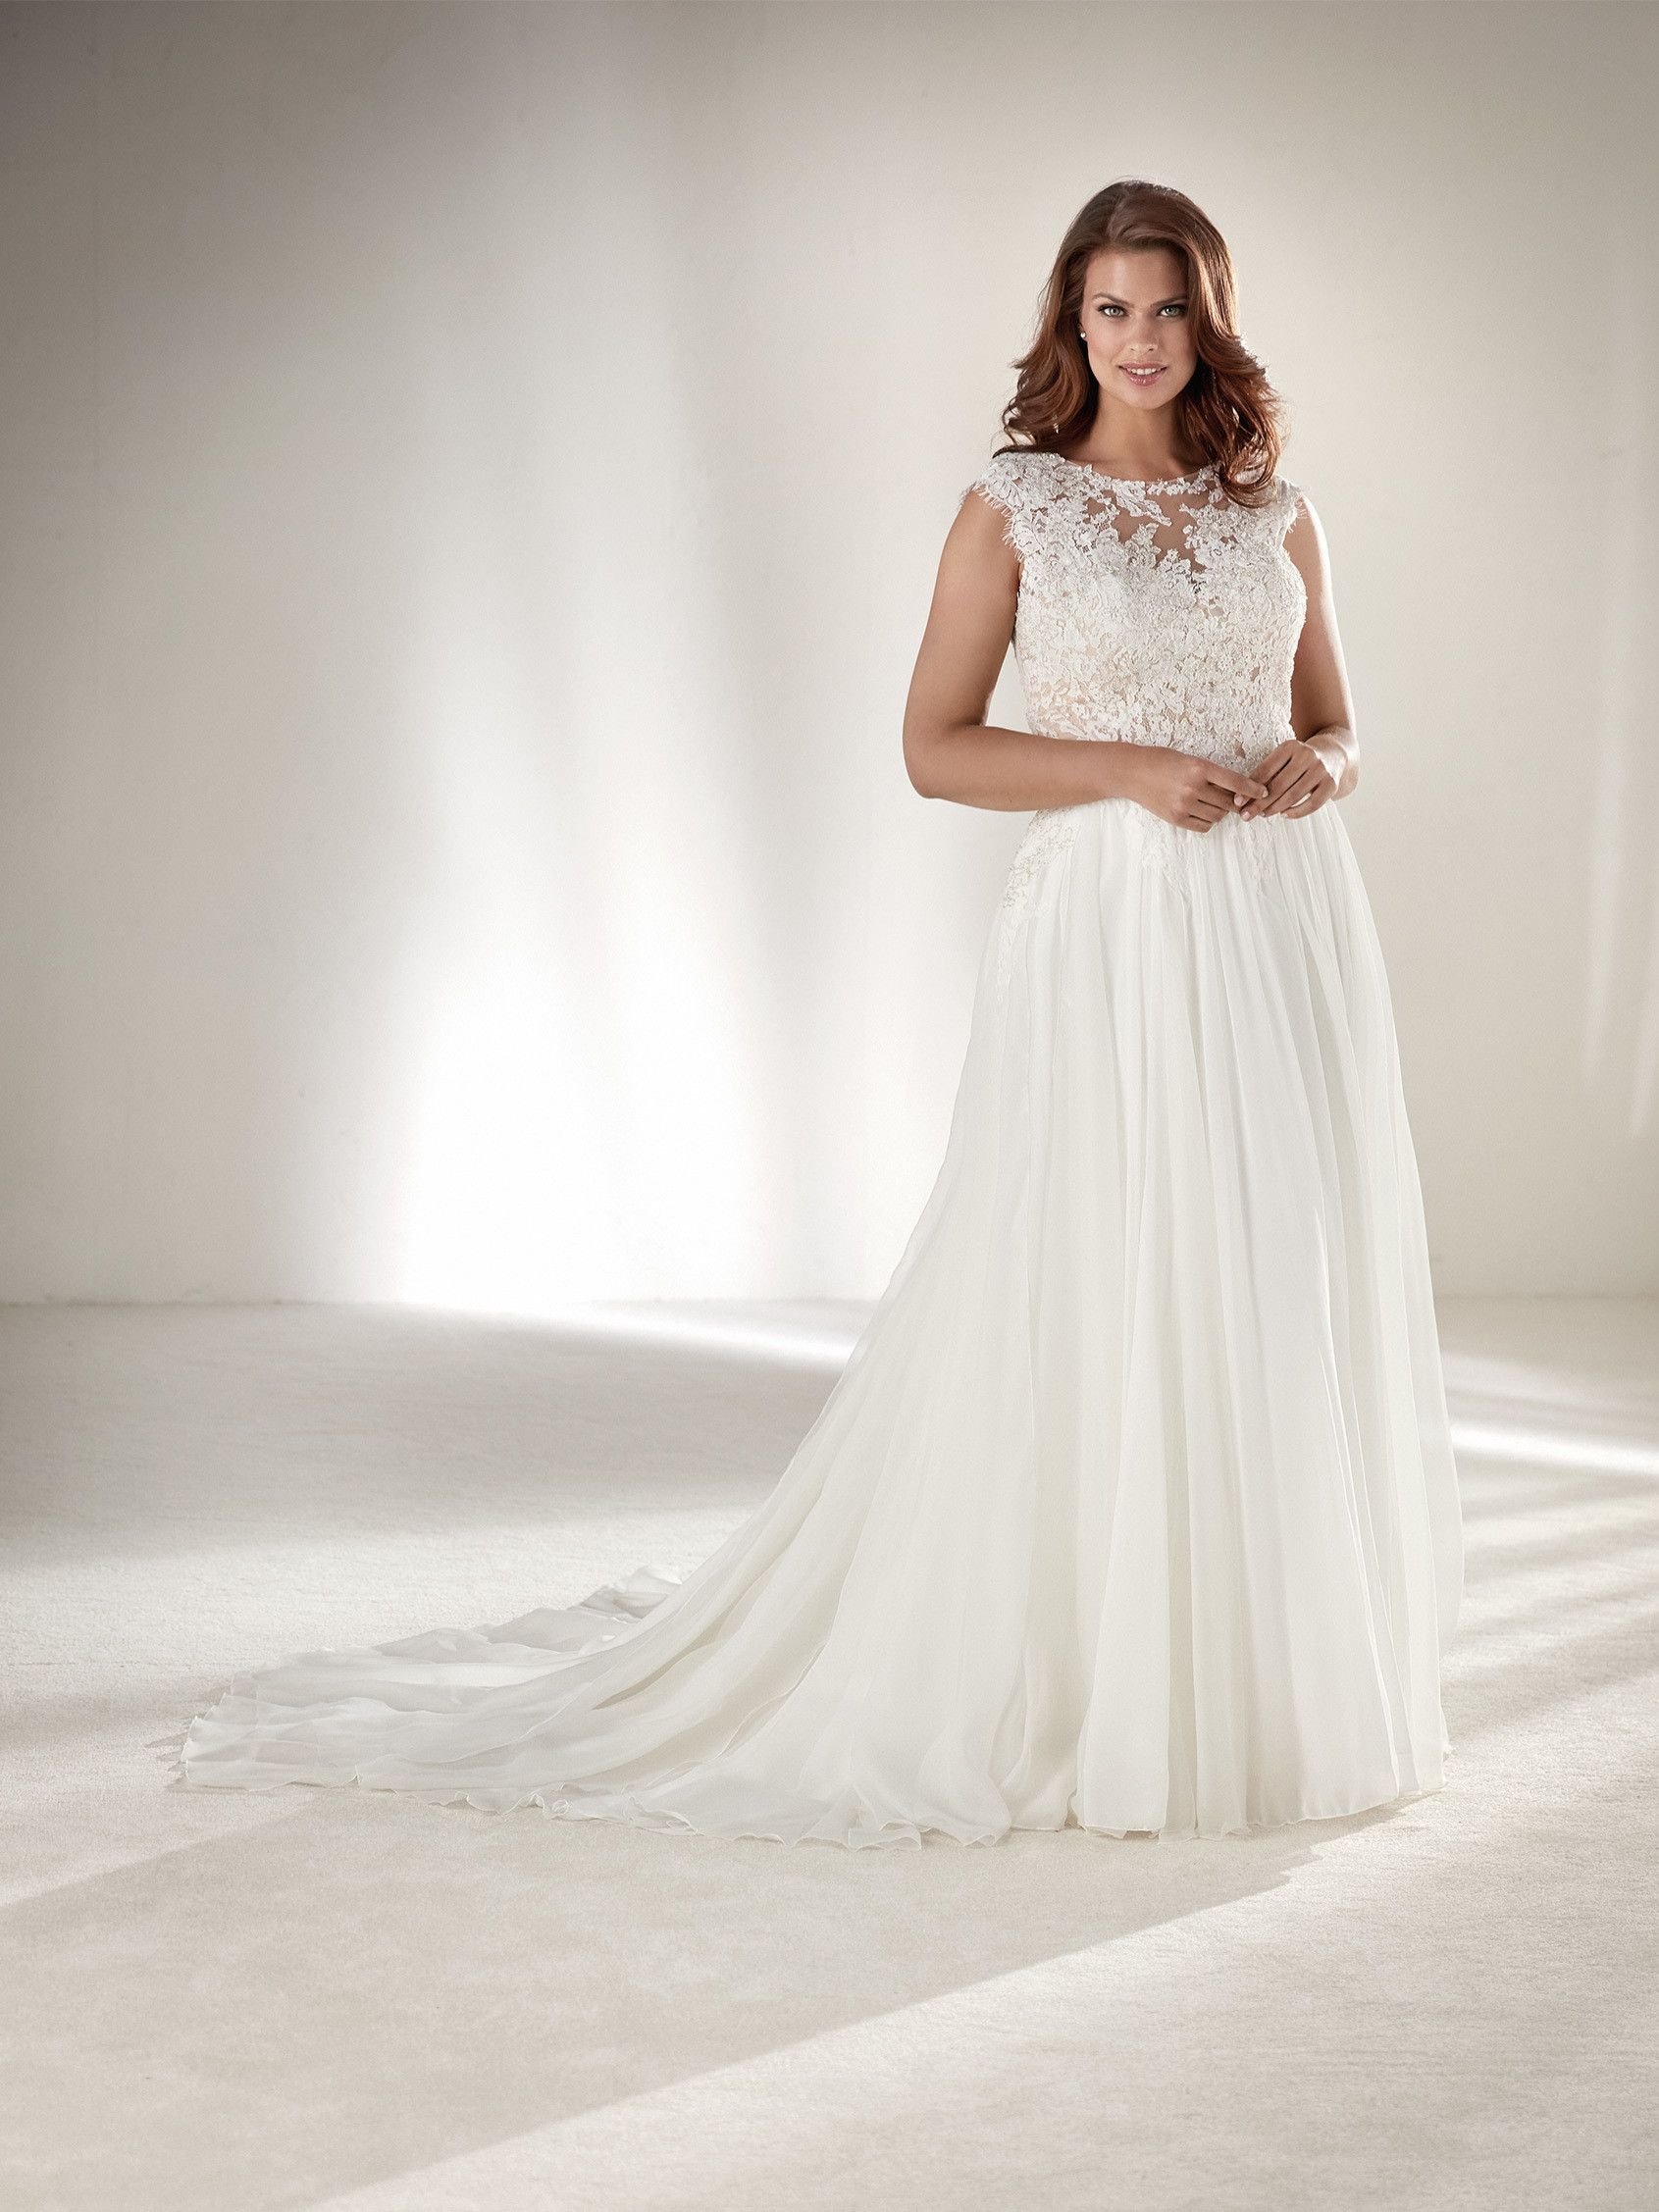 Plussize highnecked wedding dress pronovias collection